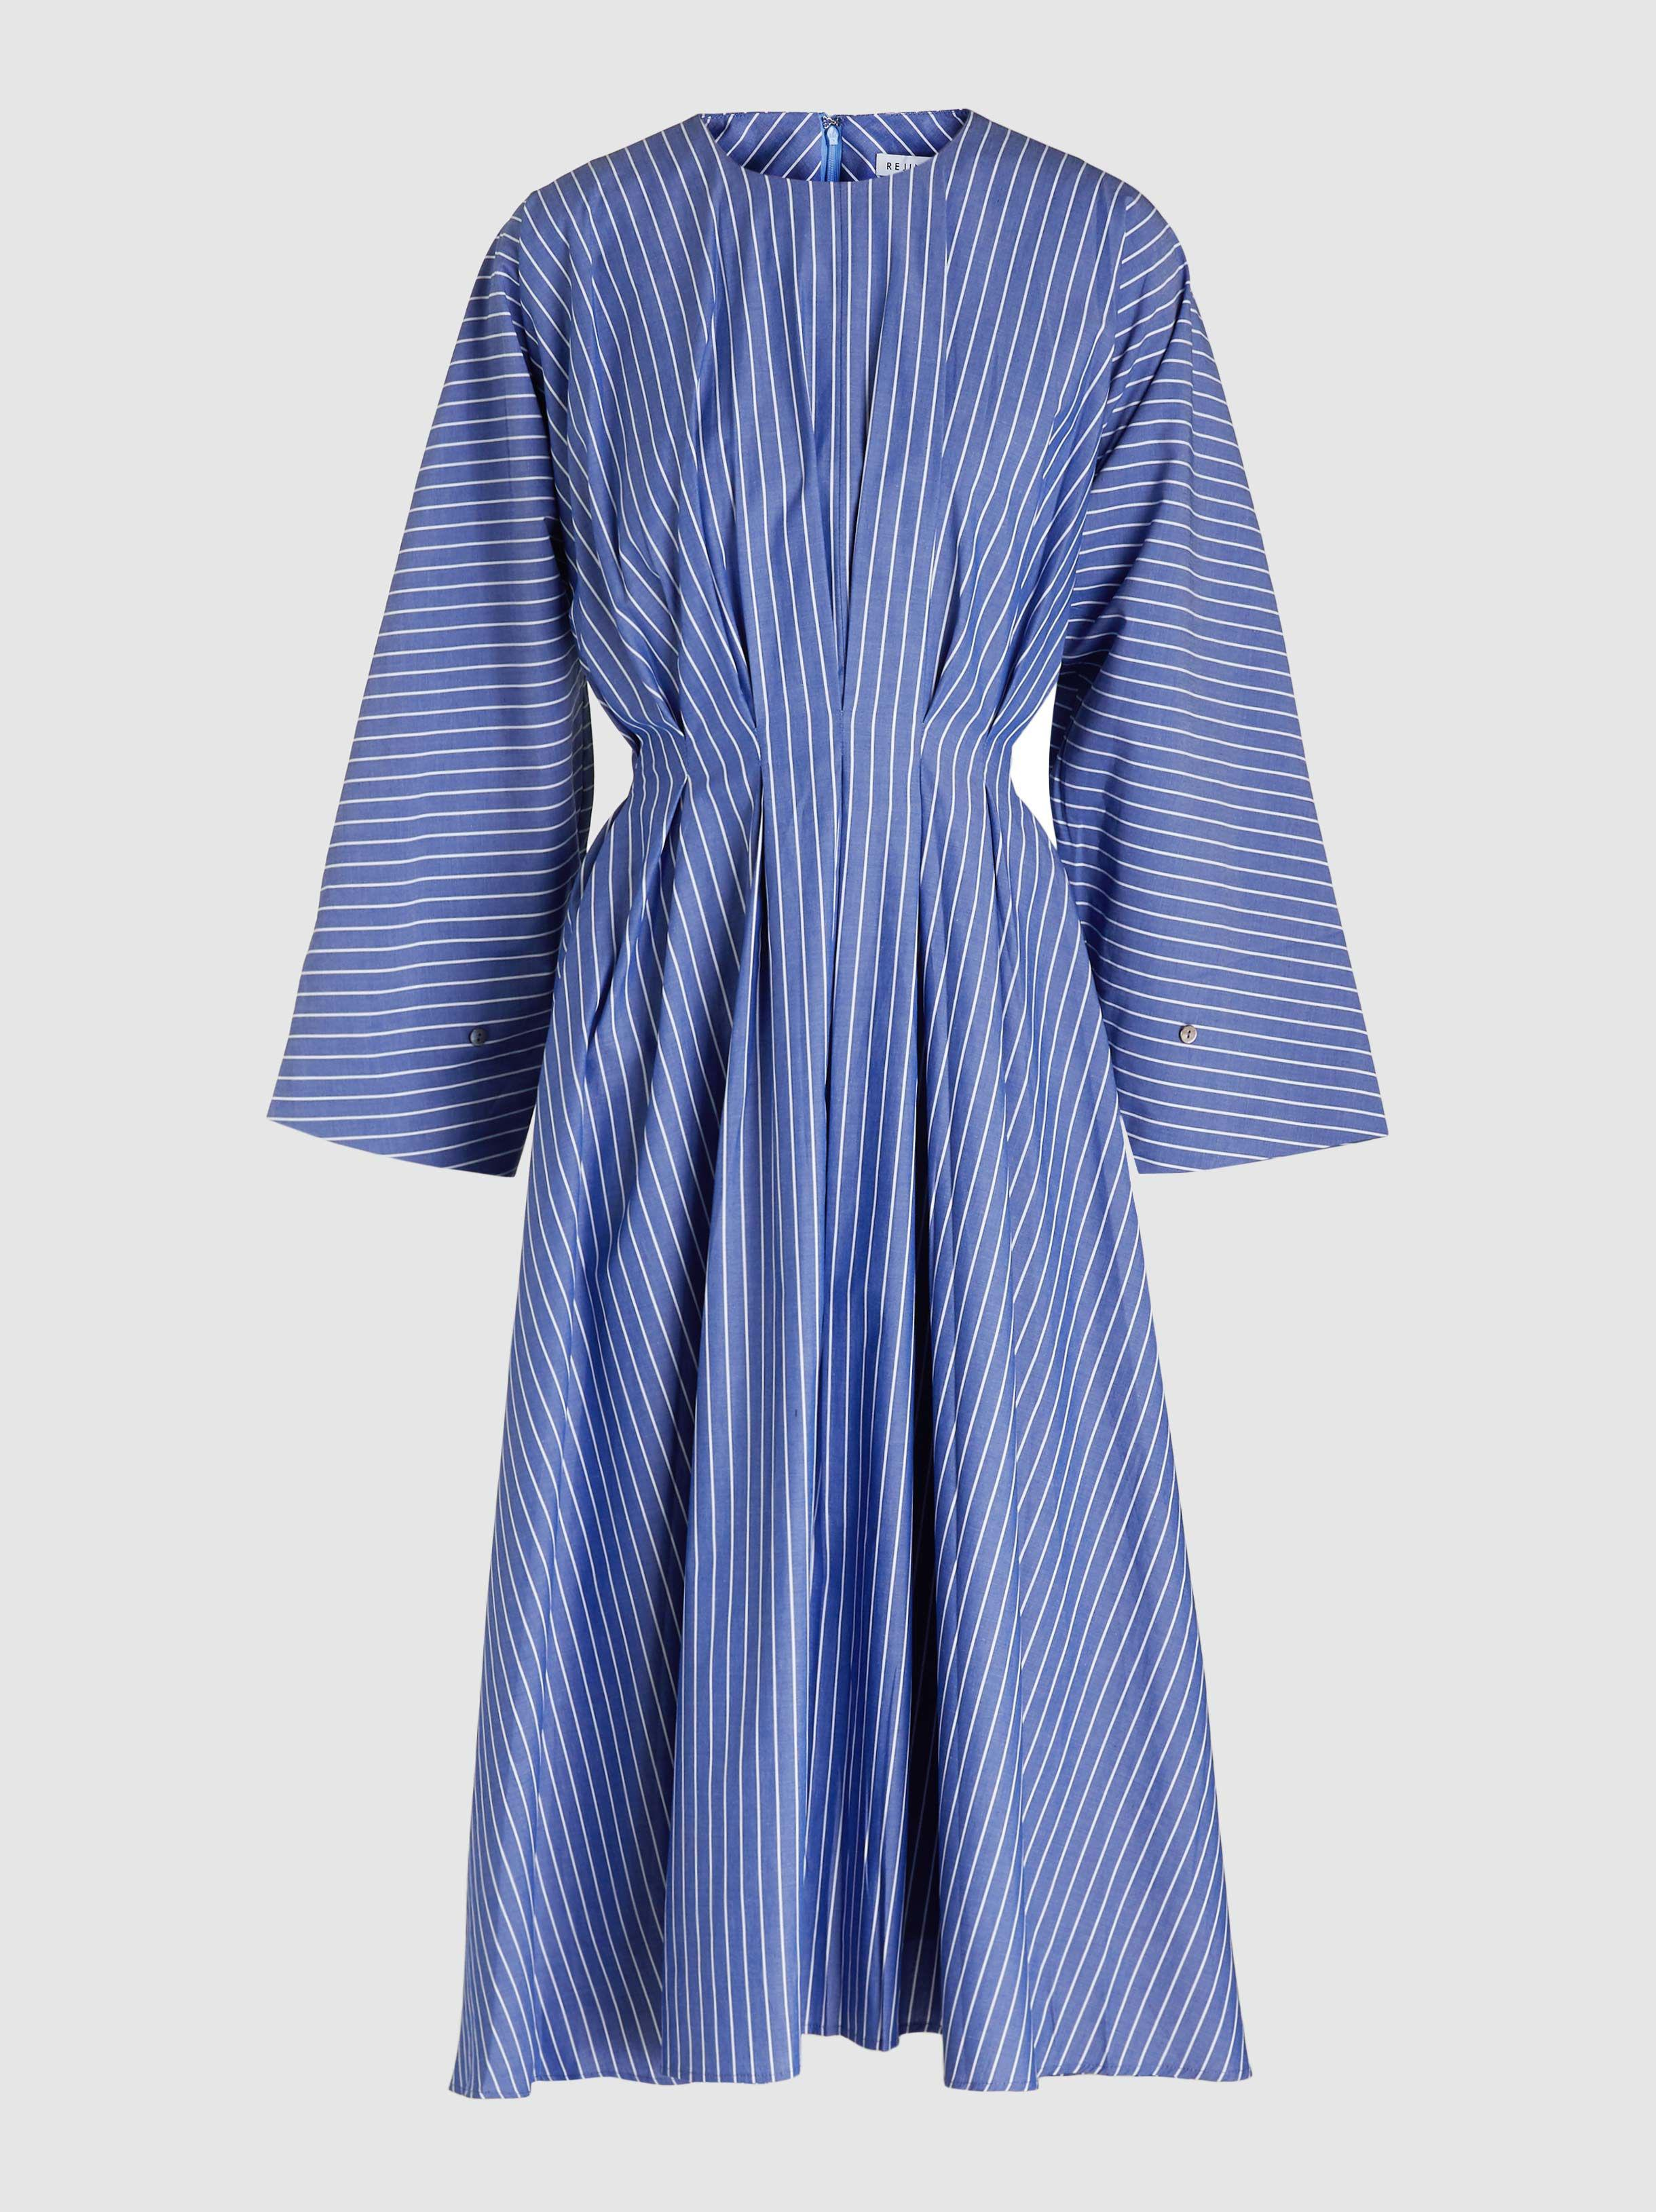 a5888c78cd Rejina Pyo Alice Pleated Striped Cotton Midi Dress in Blue - Lyst